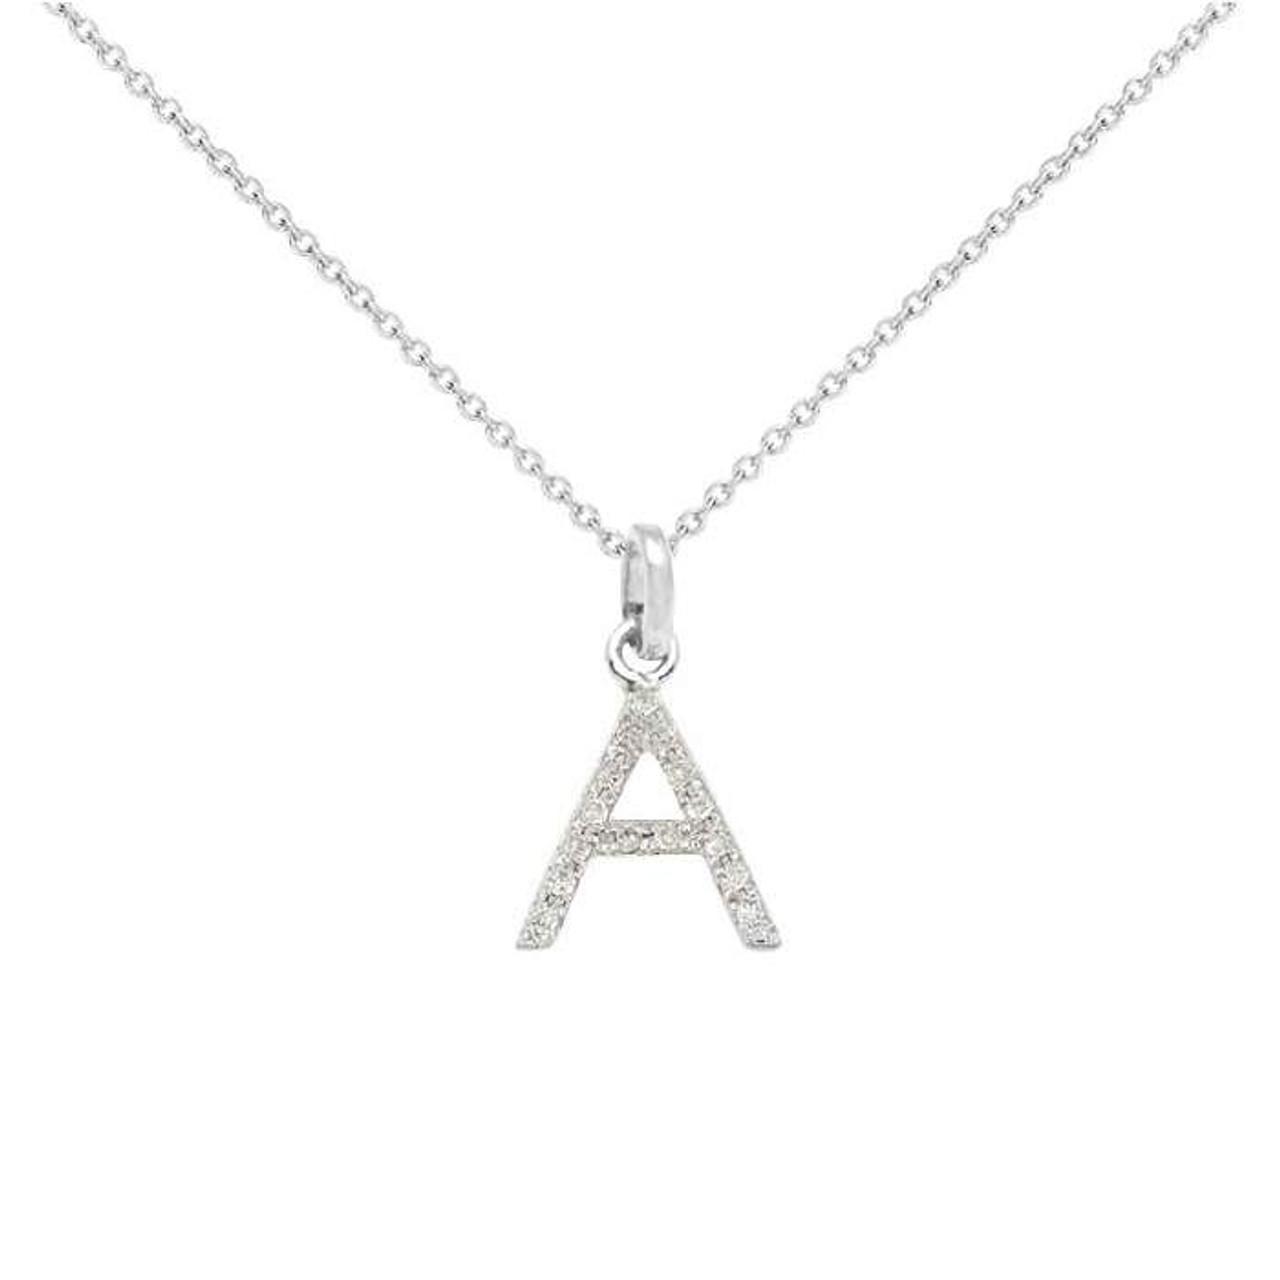 Diamond initial necklace 14k gold diamond initial necklace 14k white gold aloadofball Choice Image